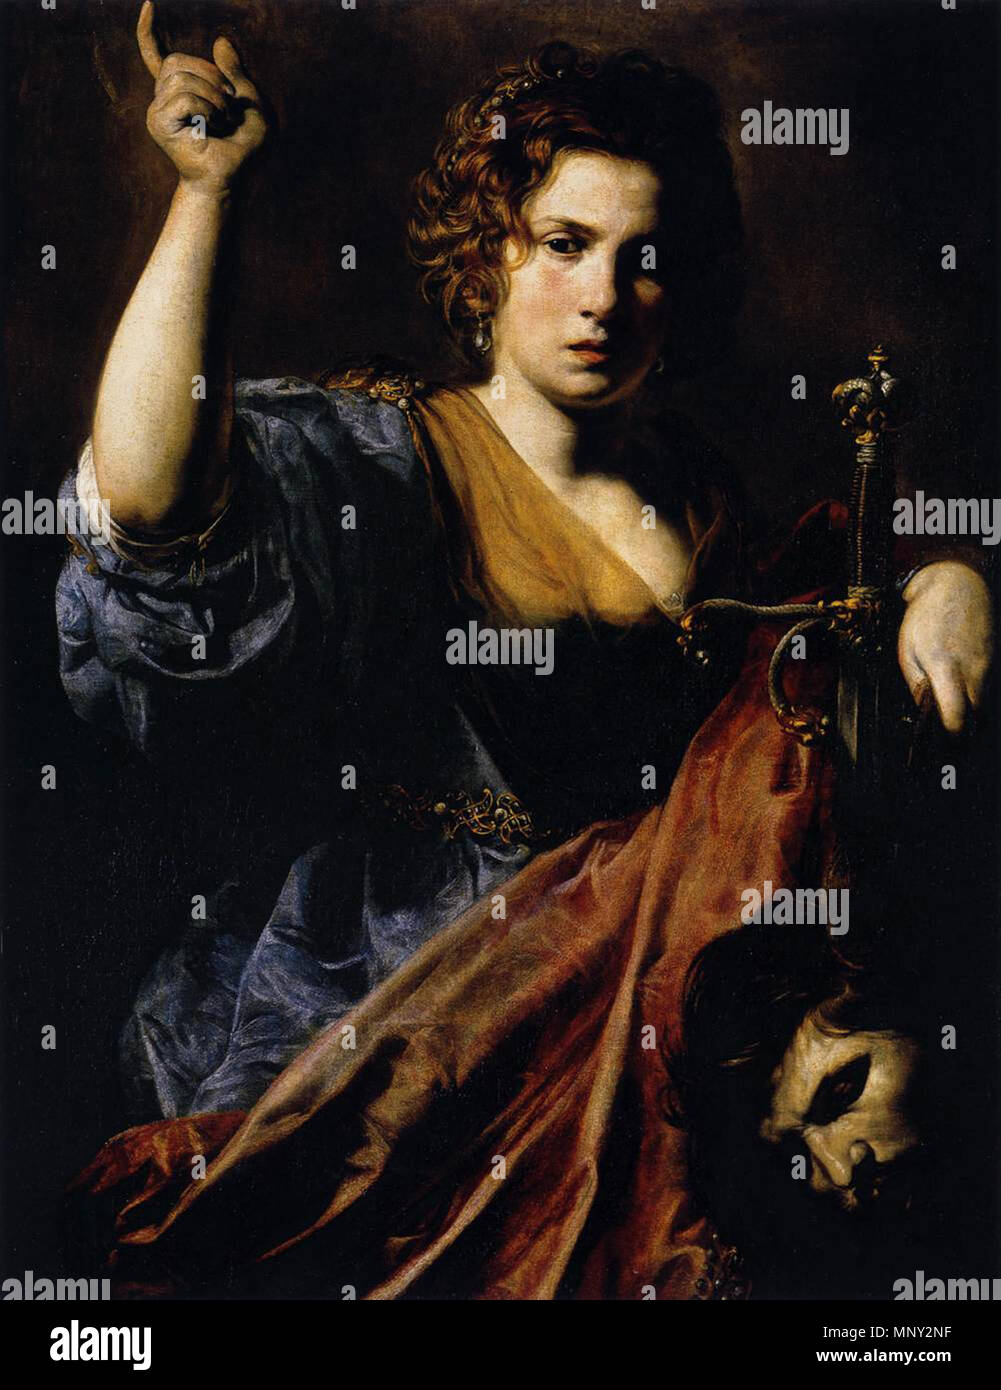 Judith   between 1626 and 1628.   1218 Valentin de Boulogne - Judith - WGA24243 - Stock Image